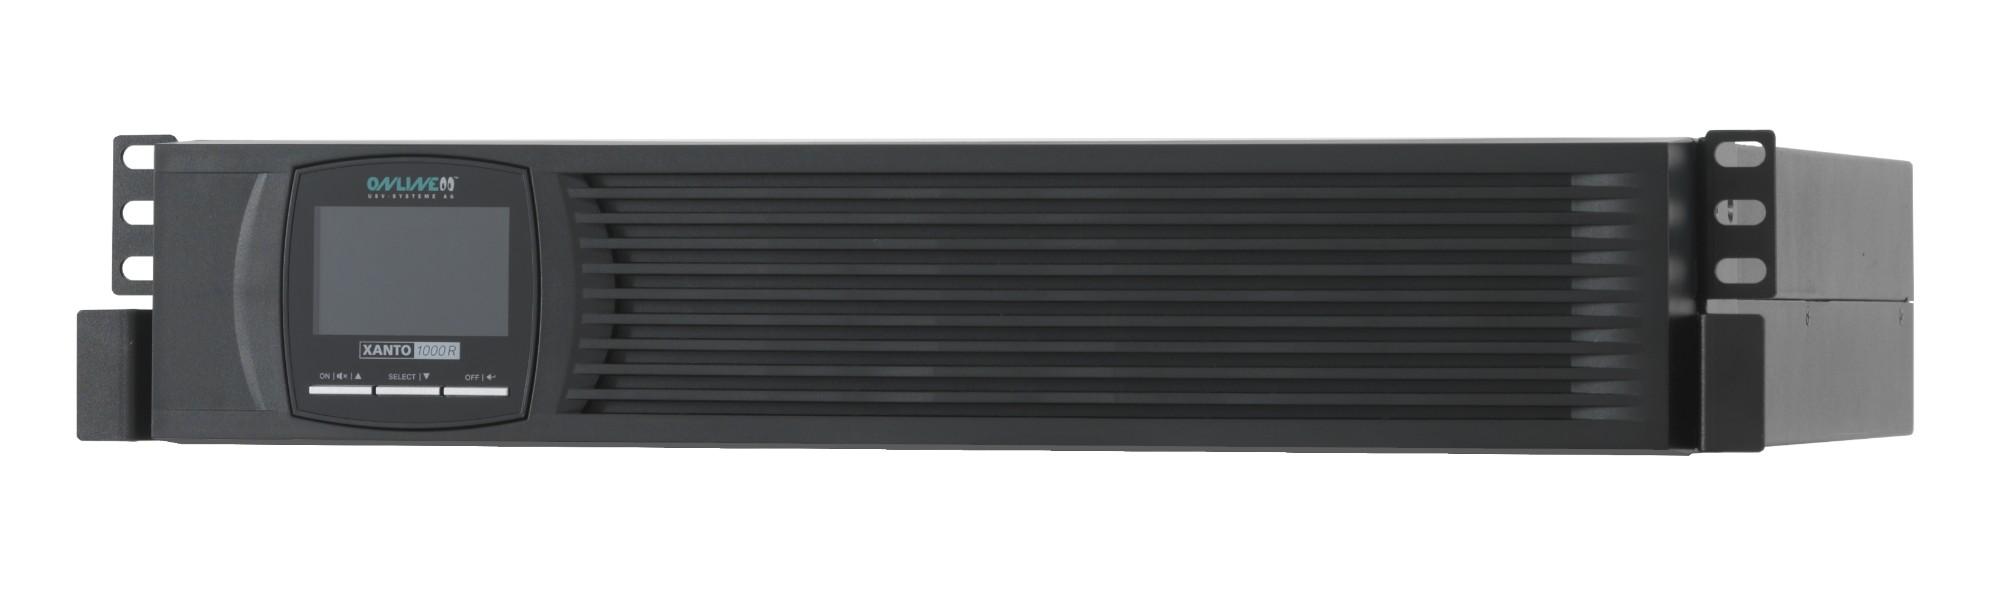 ONLINE USV-Systeme XANTO 1000R uninterruptible power supply (UPS) Double-conversion (Online) 1000 VA